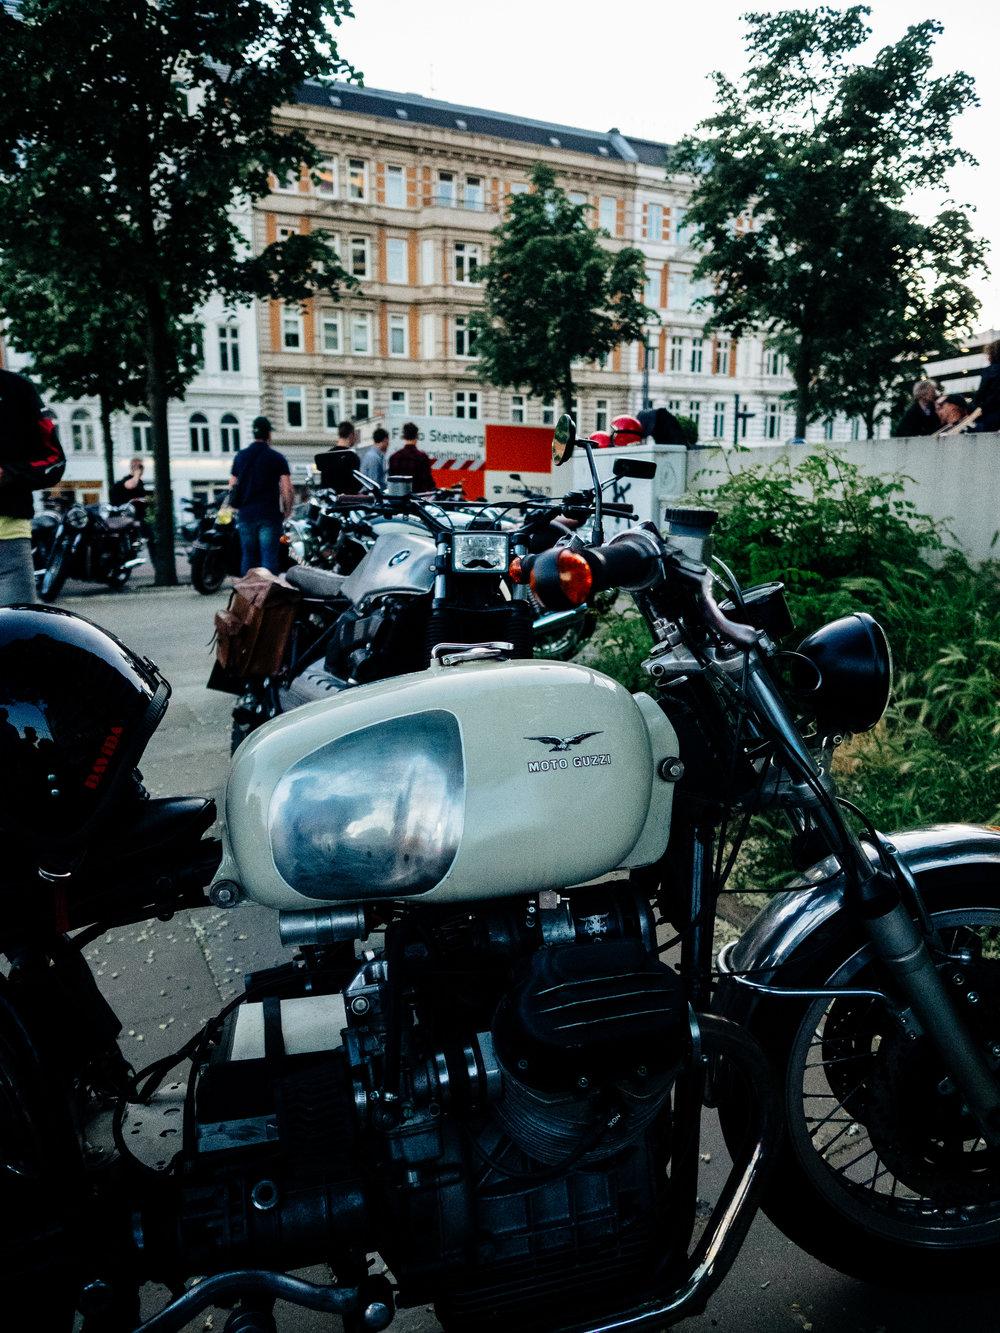 180524_themotosocial_Hamburg-113.jpg